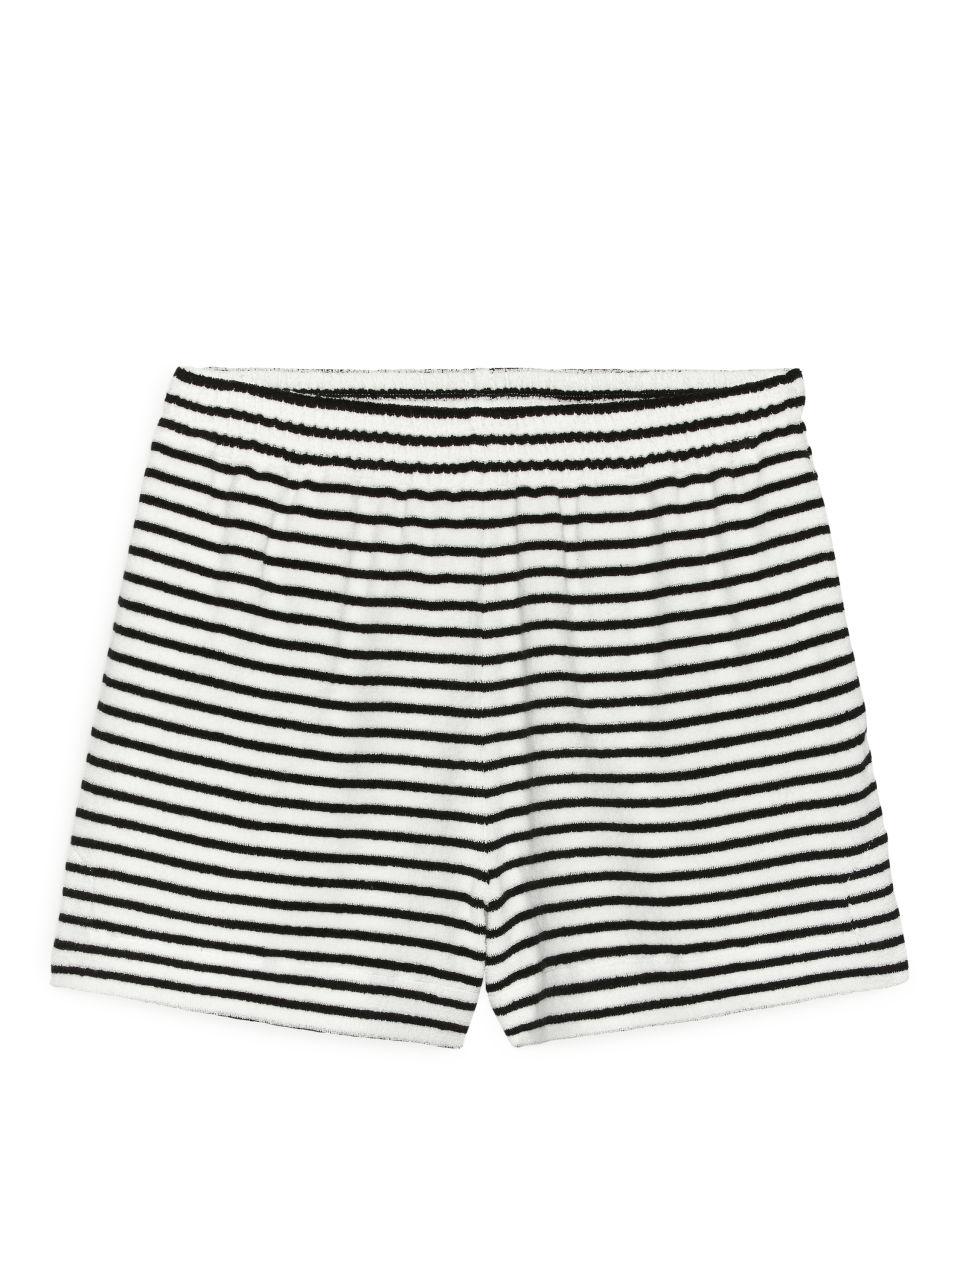 Towelling Shorts - Black